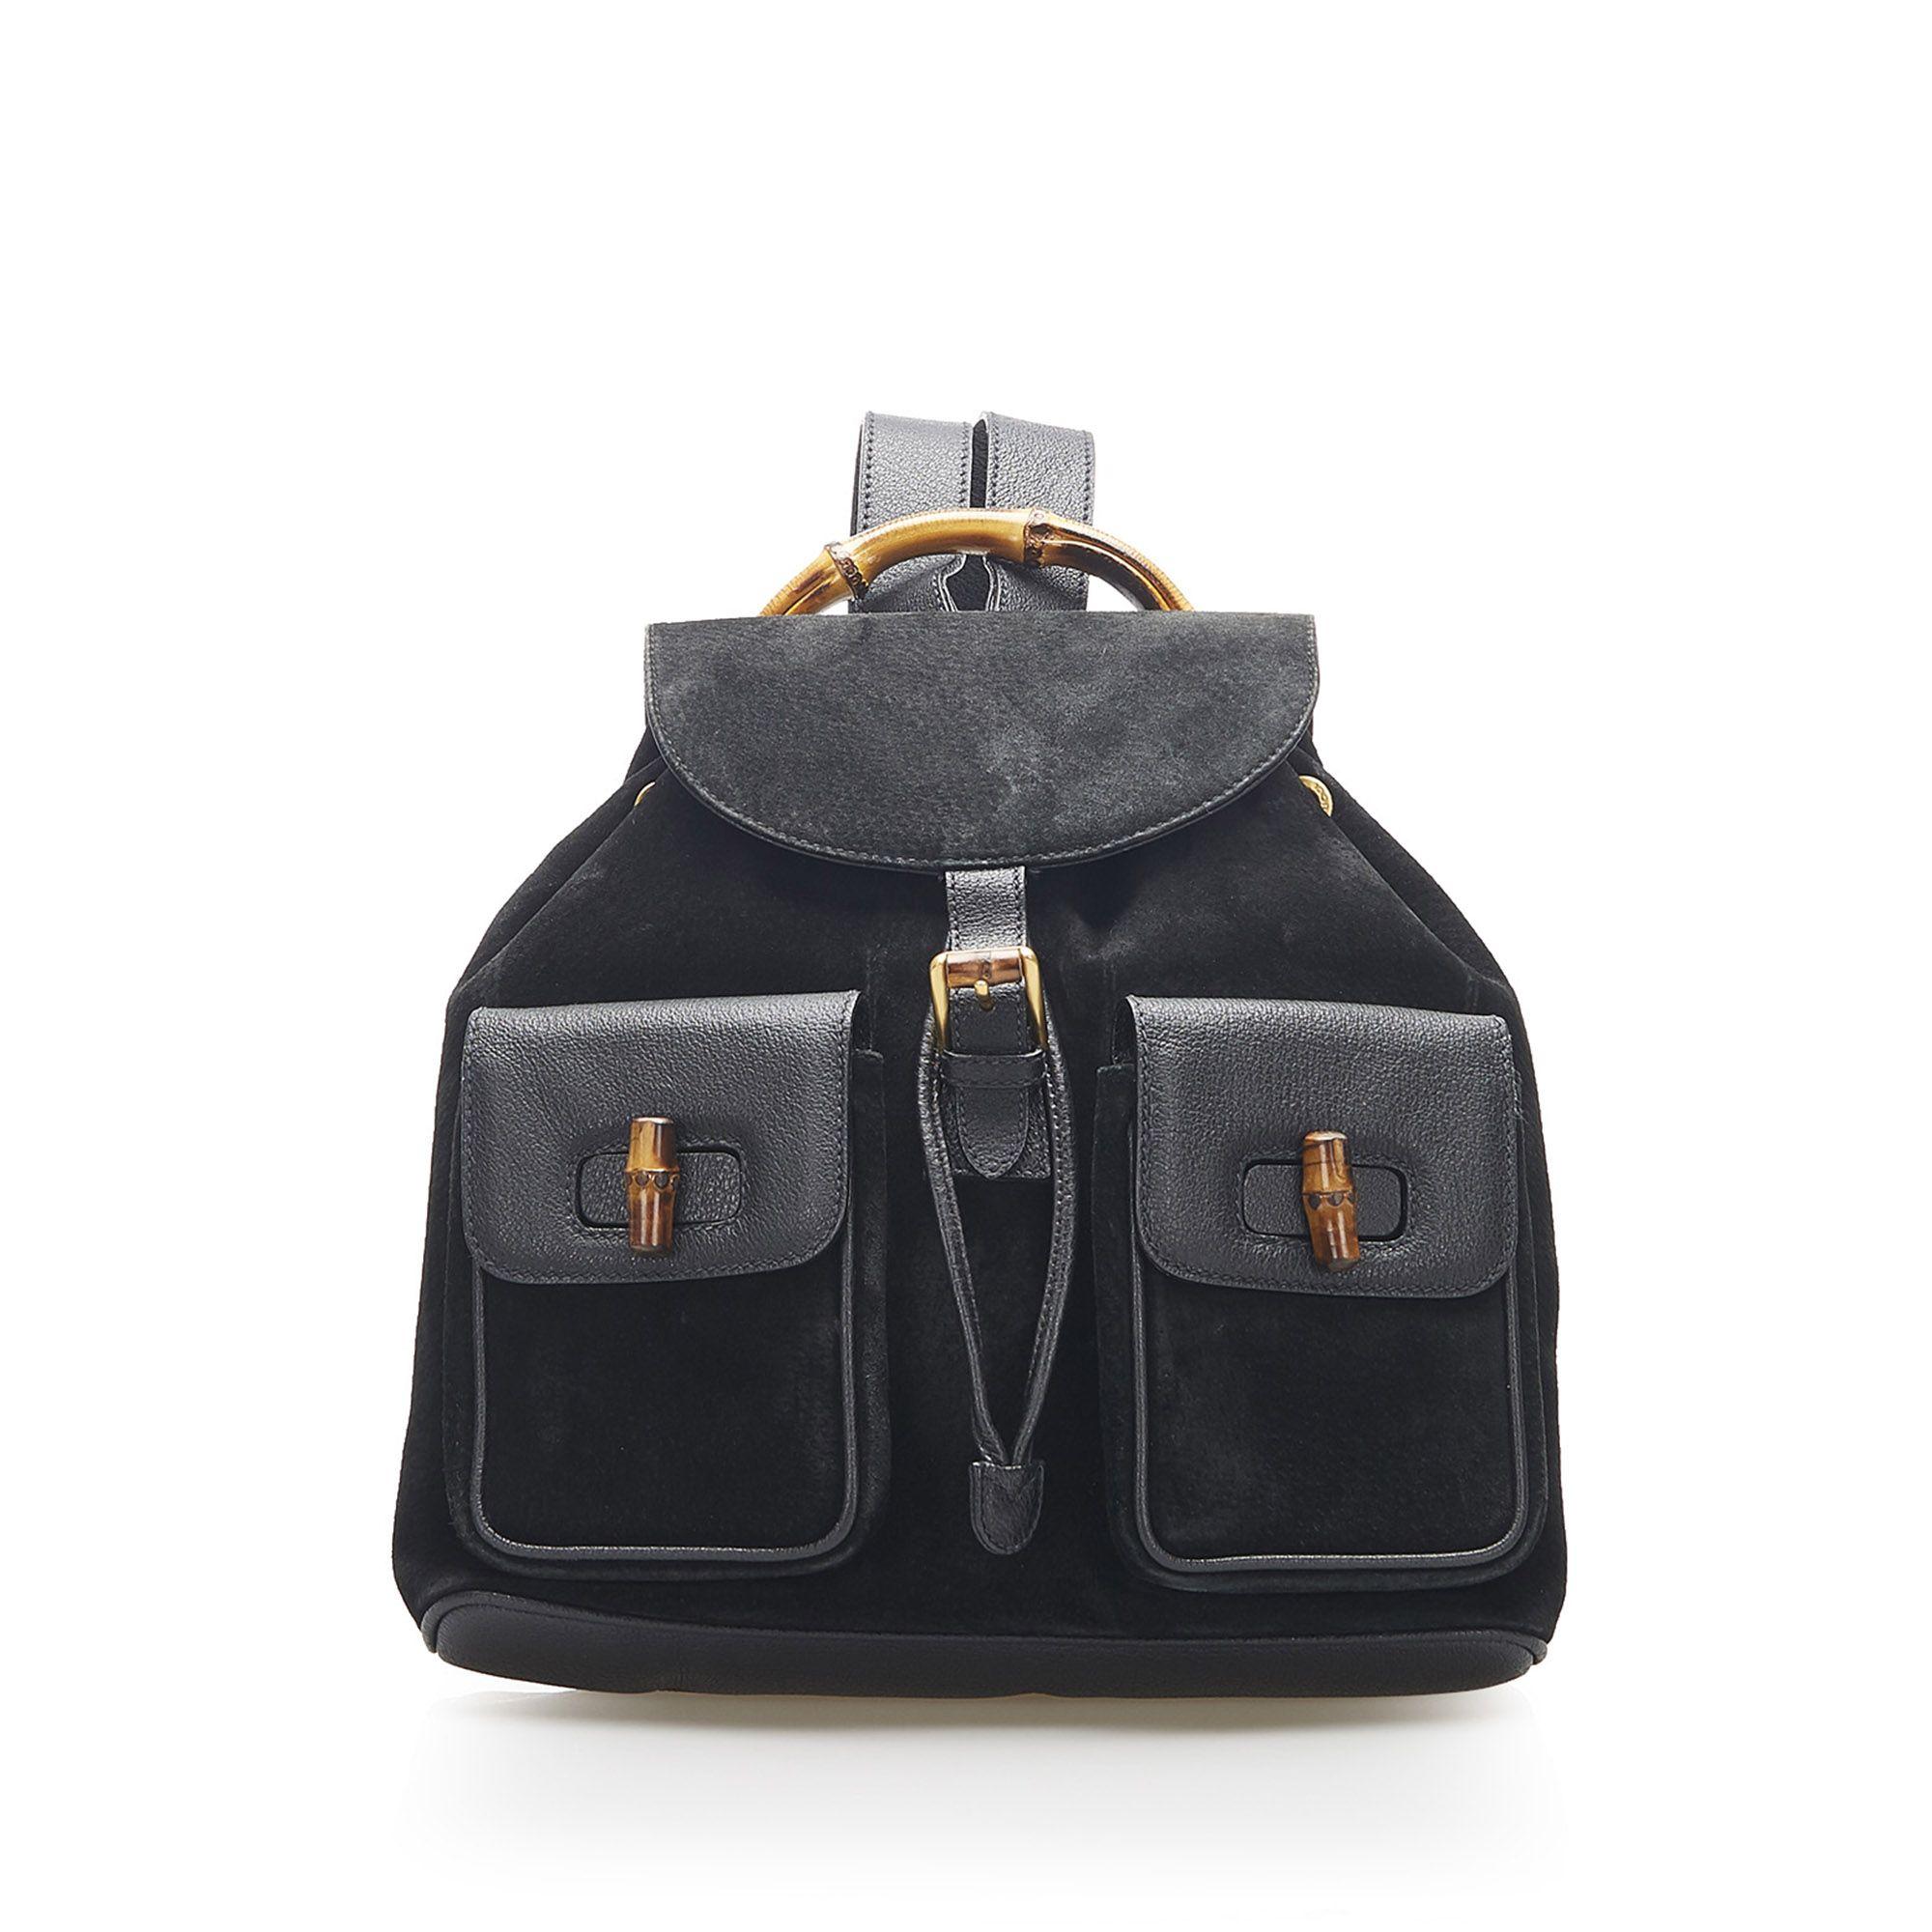 Vintage Gucci Bamboo Suede Drawstring Backpack Black